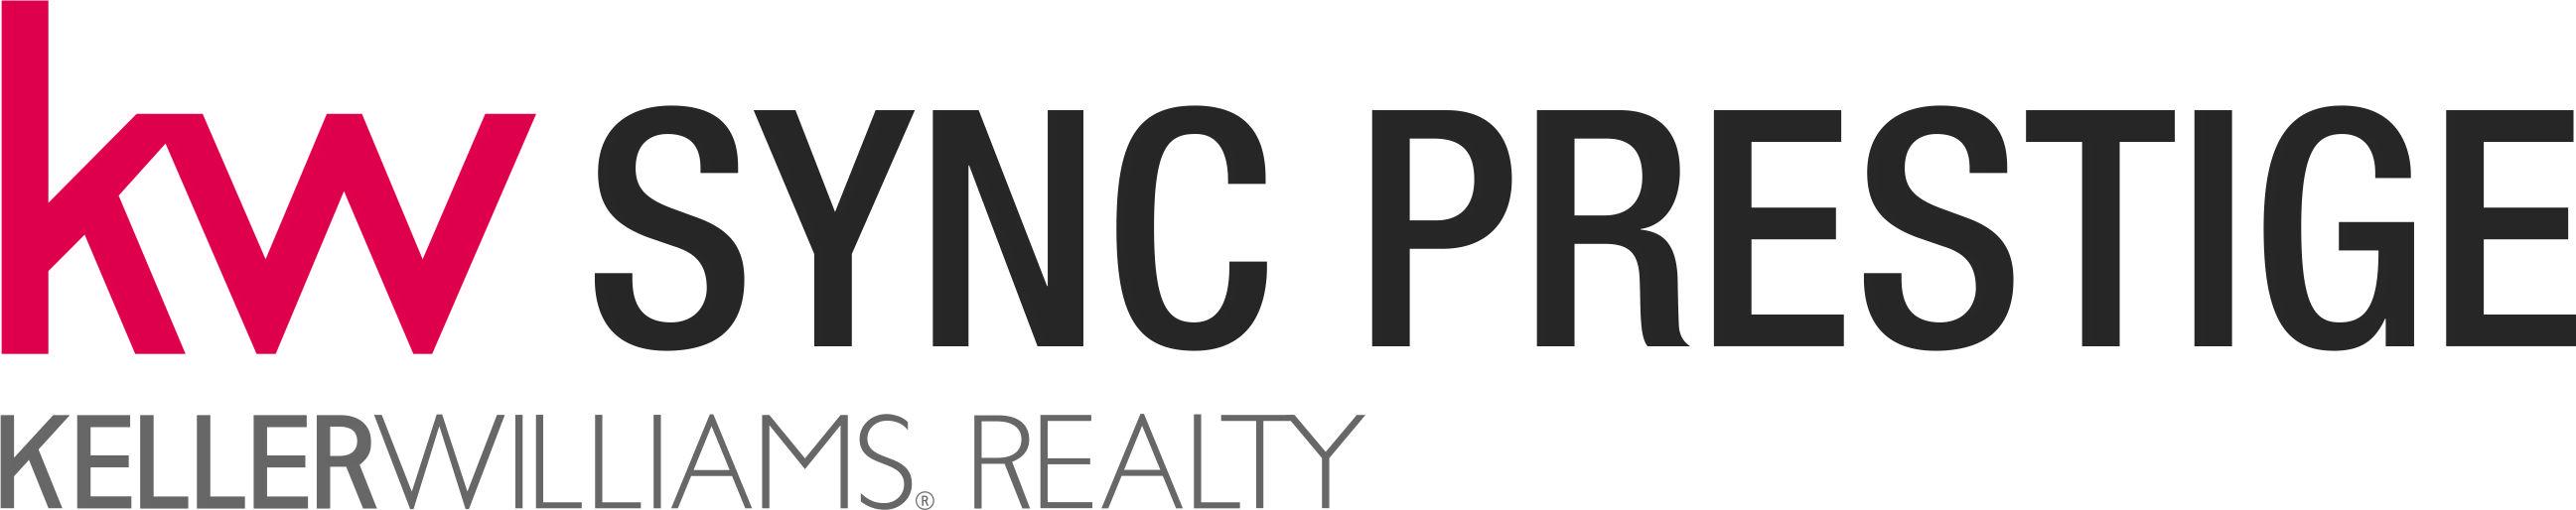 KW Sync Prestige office logo